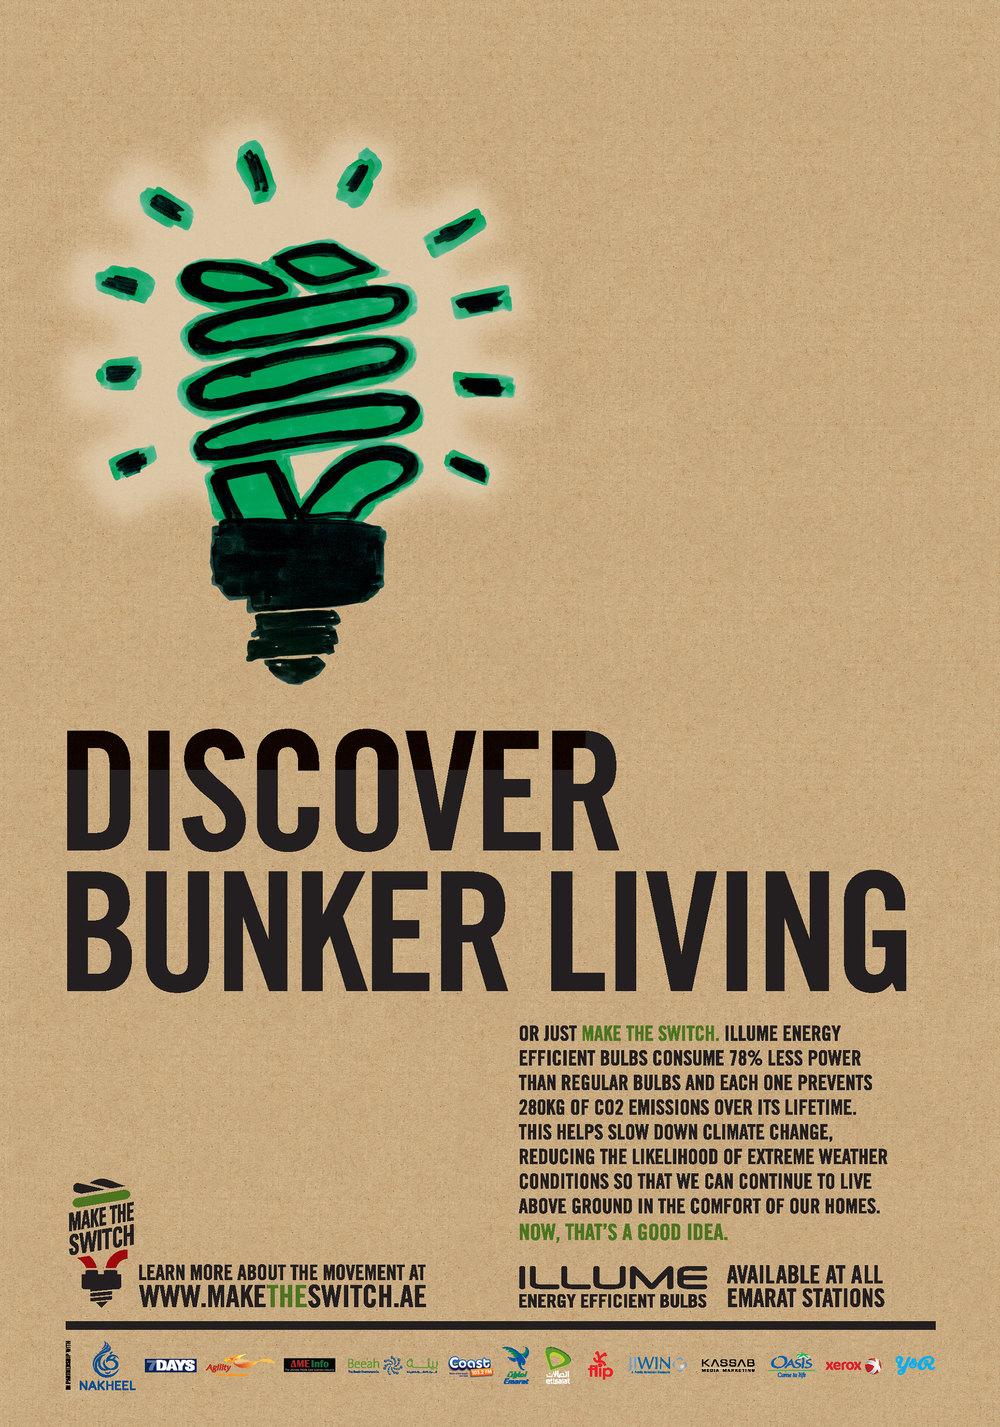 Discover bunker living.